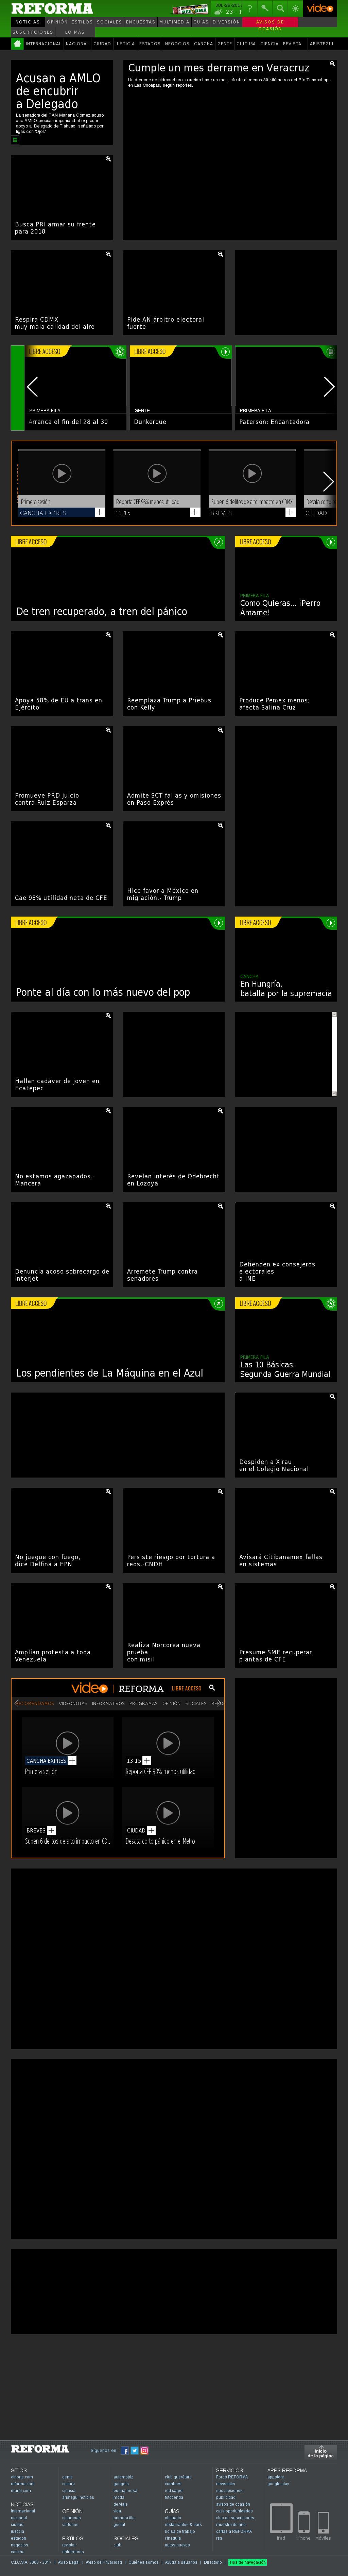 Reforma.com at Friday July 28, 2017, 11:16 p.m. UTC